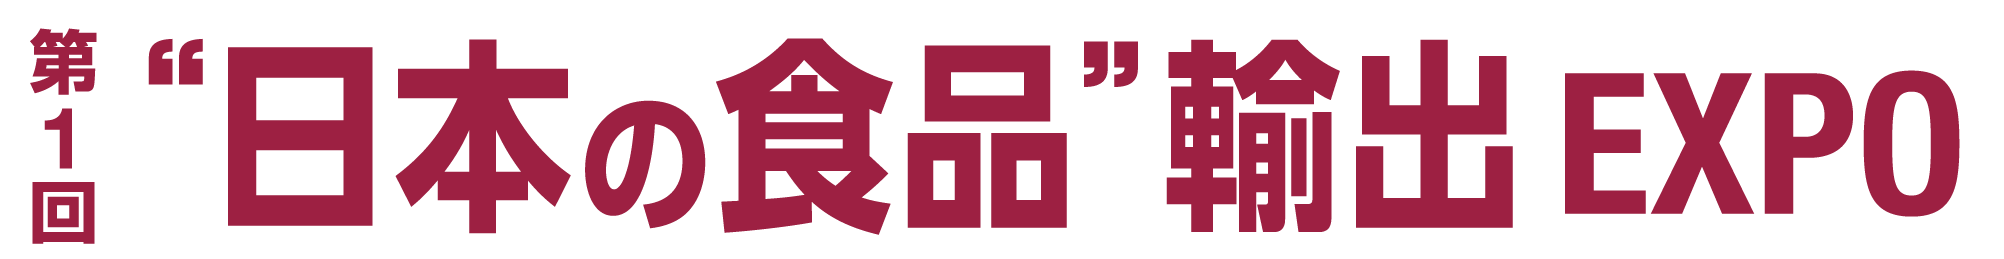 FOOD2017_LOG_j